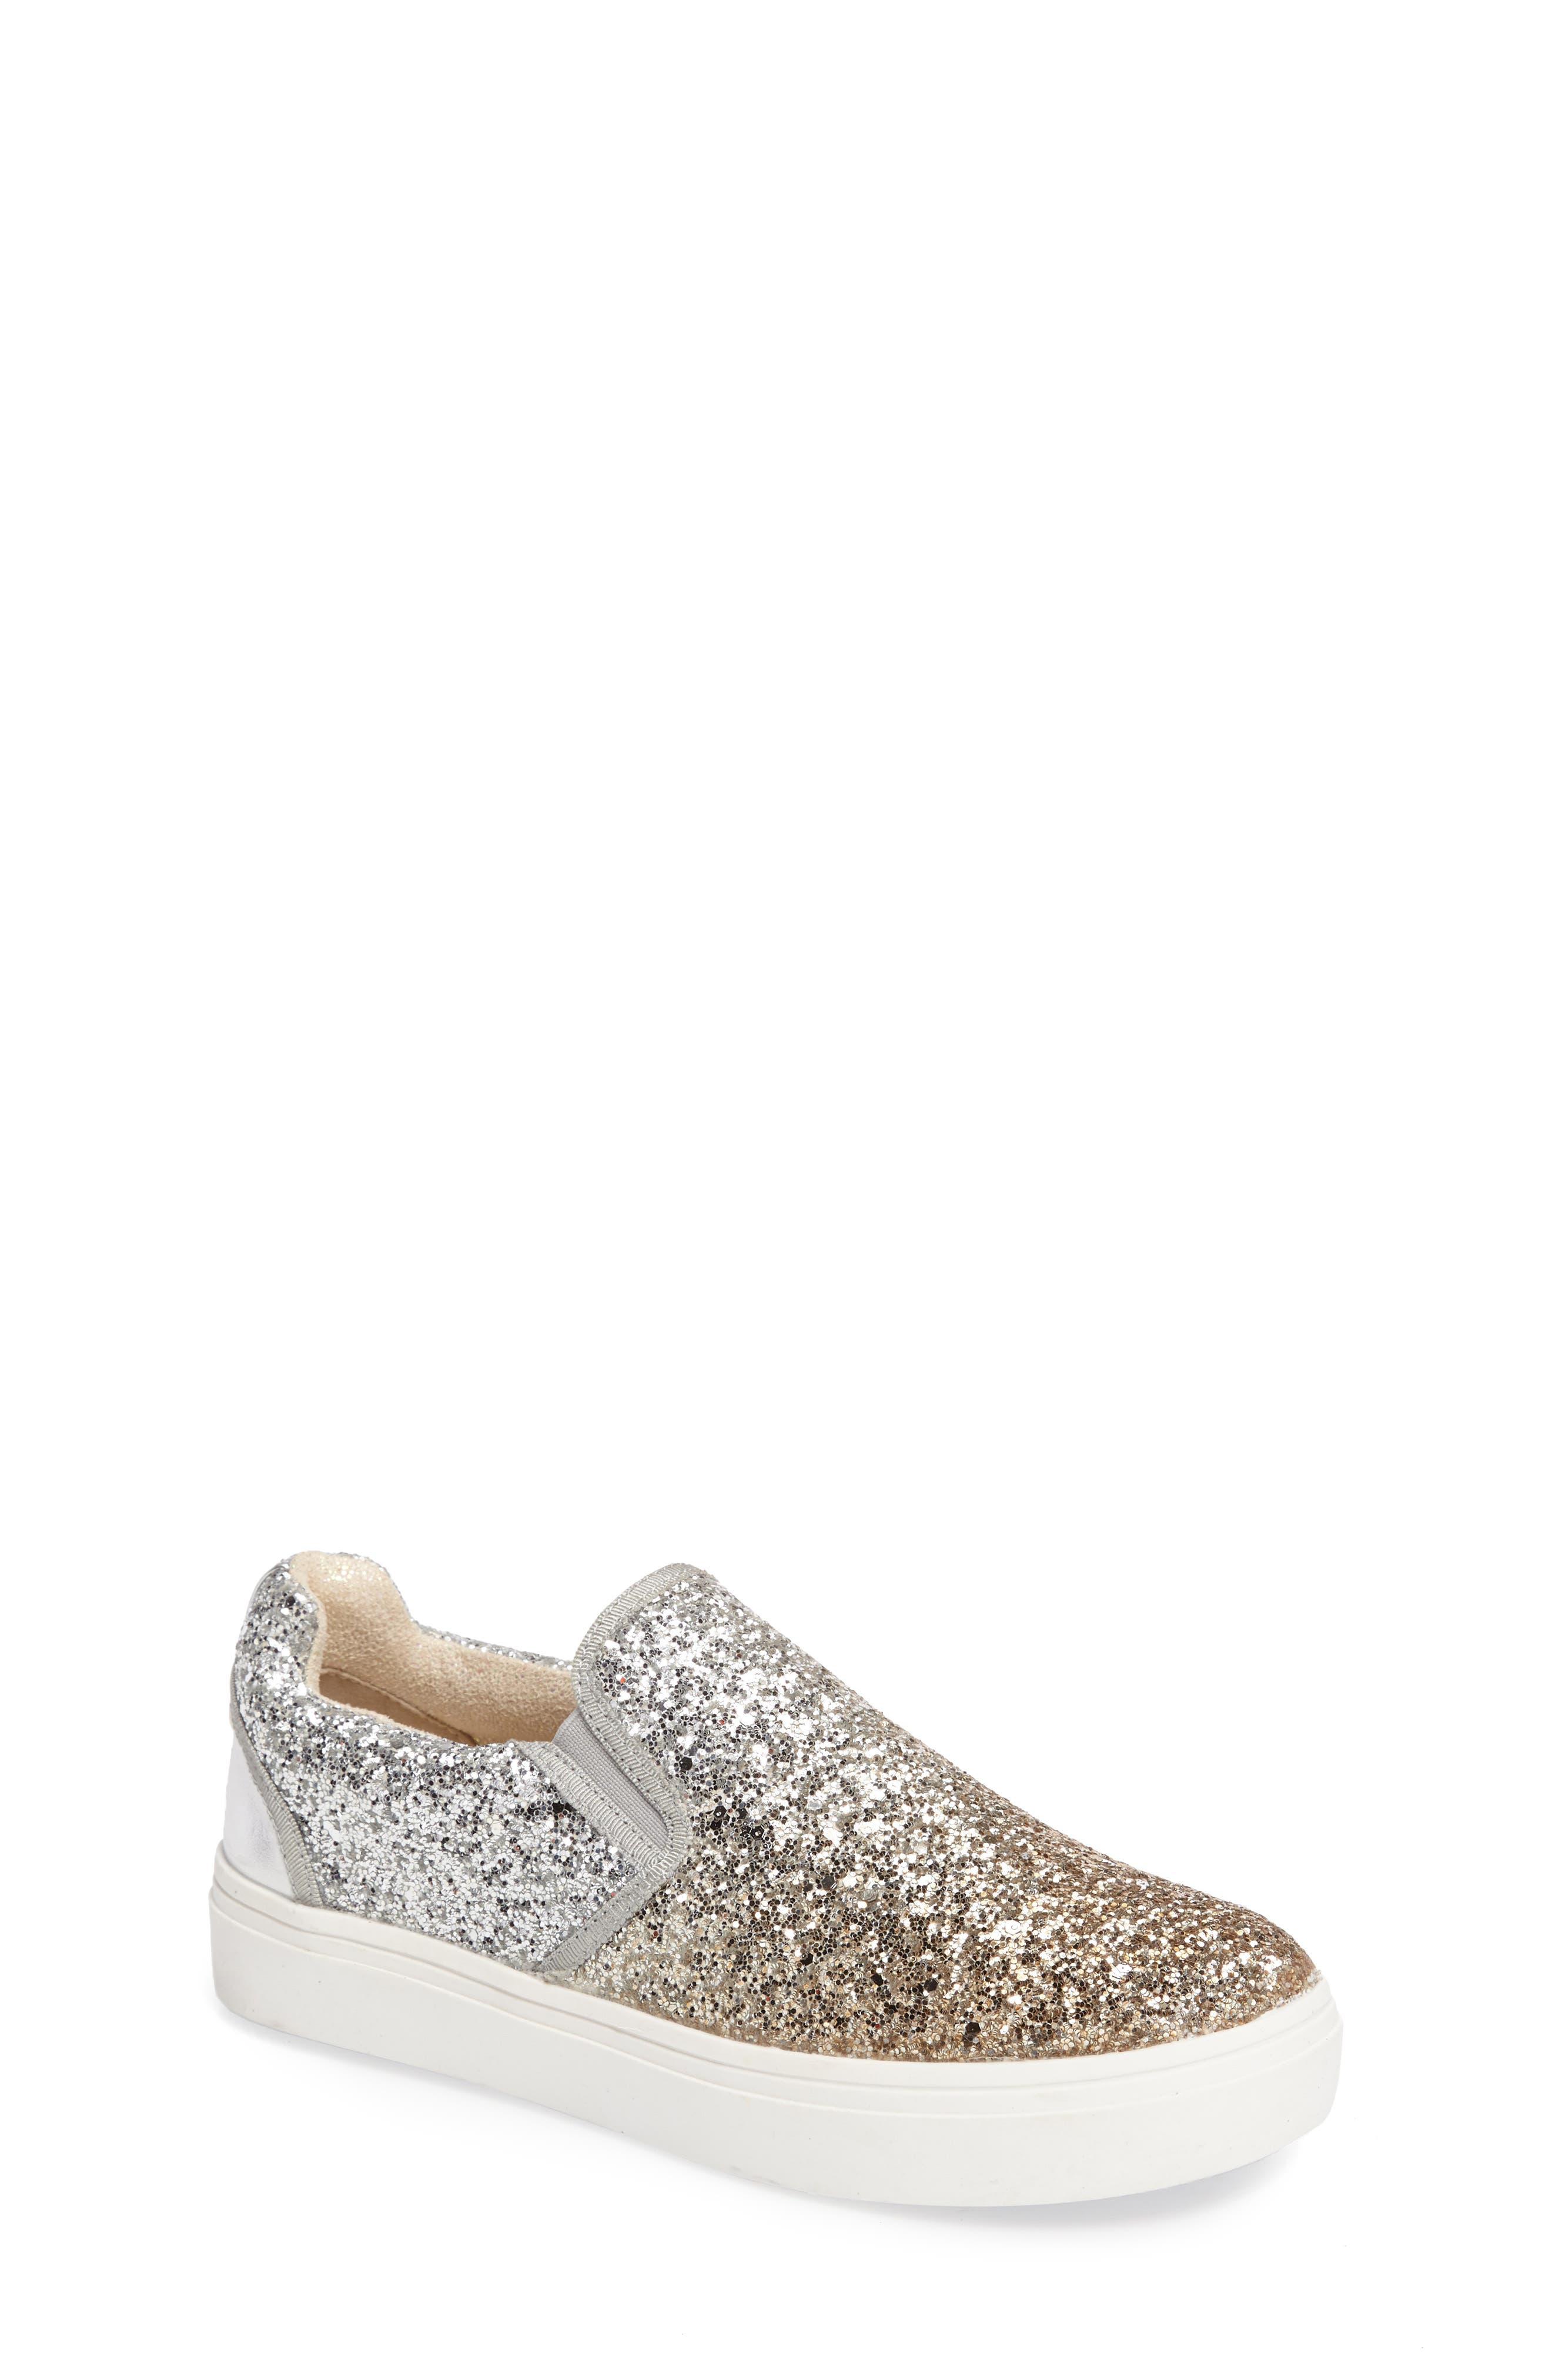 Double Marcia Glitter Platform Sneaker,                         Main,                         color, 040